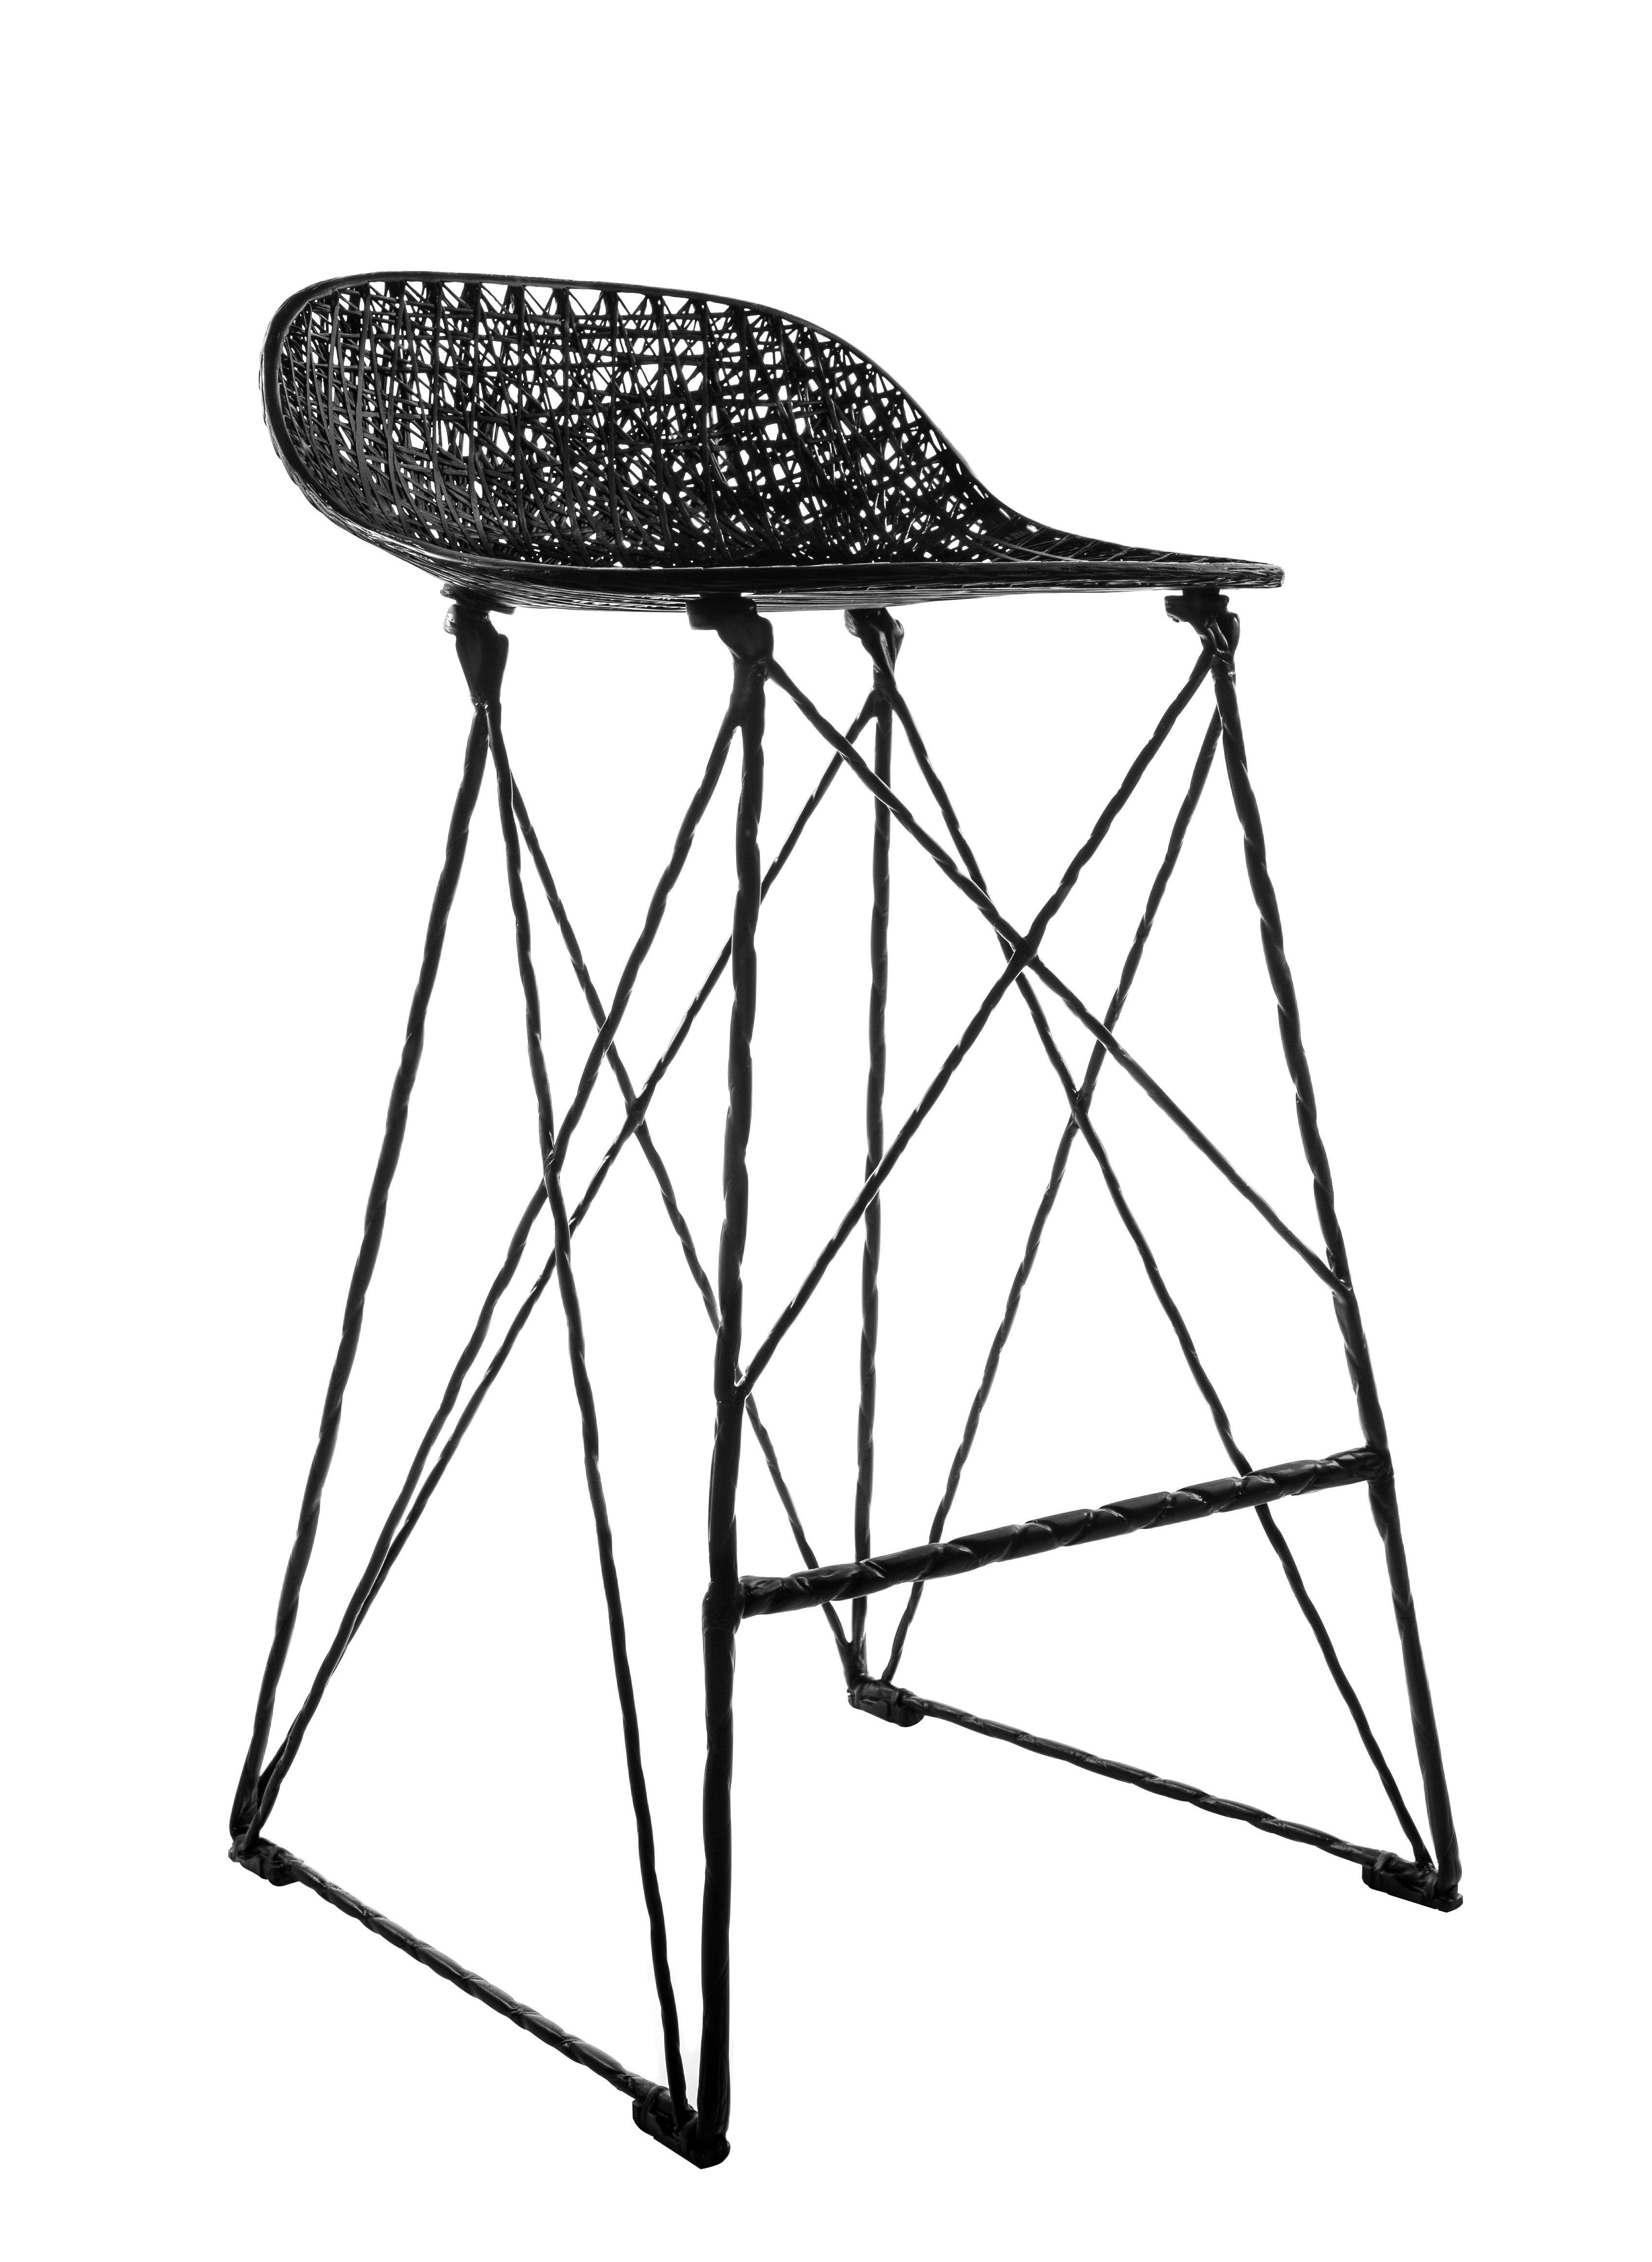 119c3e3f4e86cf080bc79298ed0bee90 Frais De Chaise De Bar Noir Concept